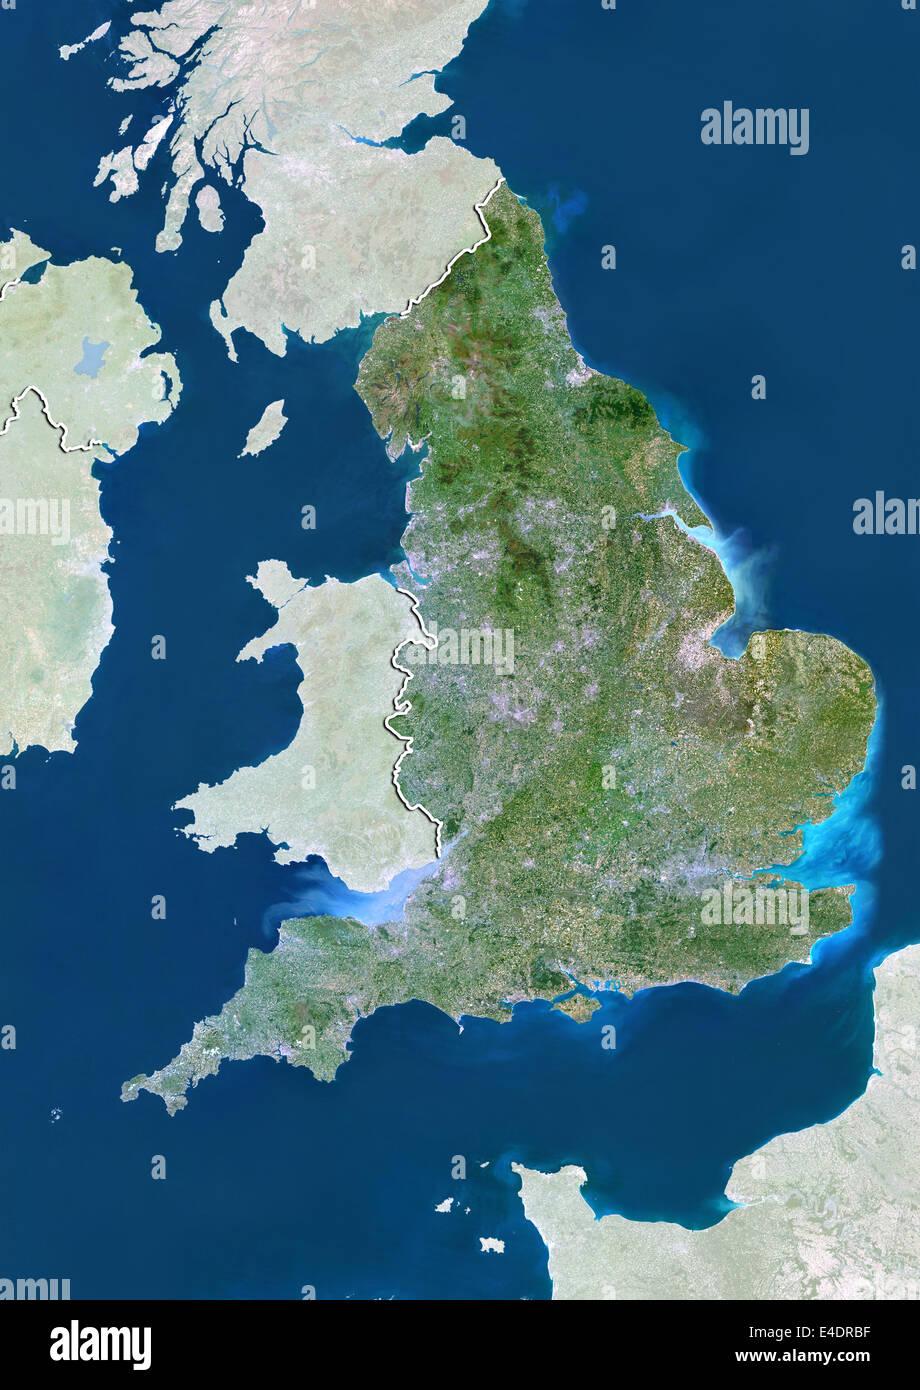 England, United Kingdom, True Colour Satellite Image Stock Photo